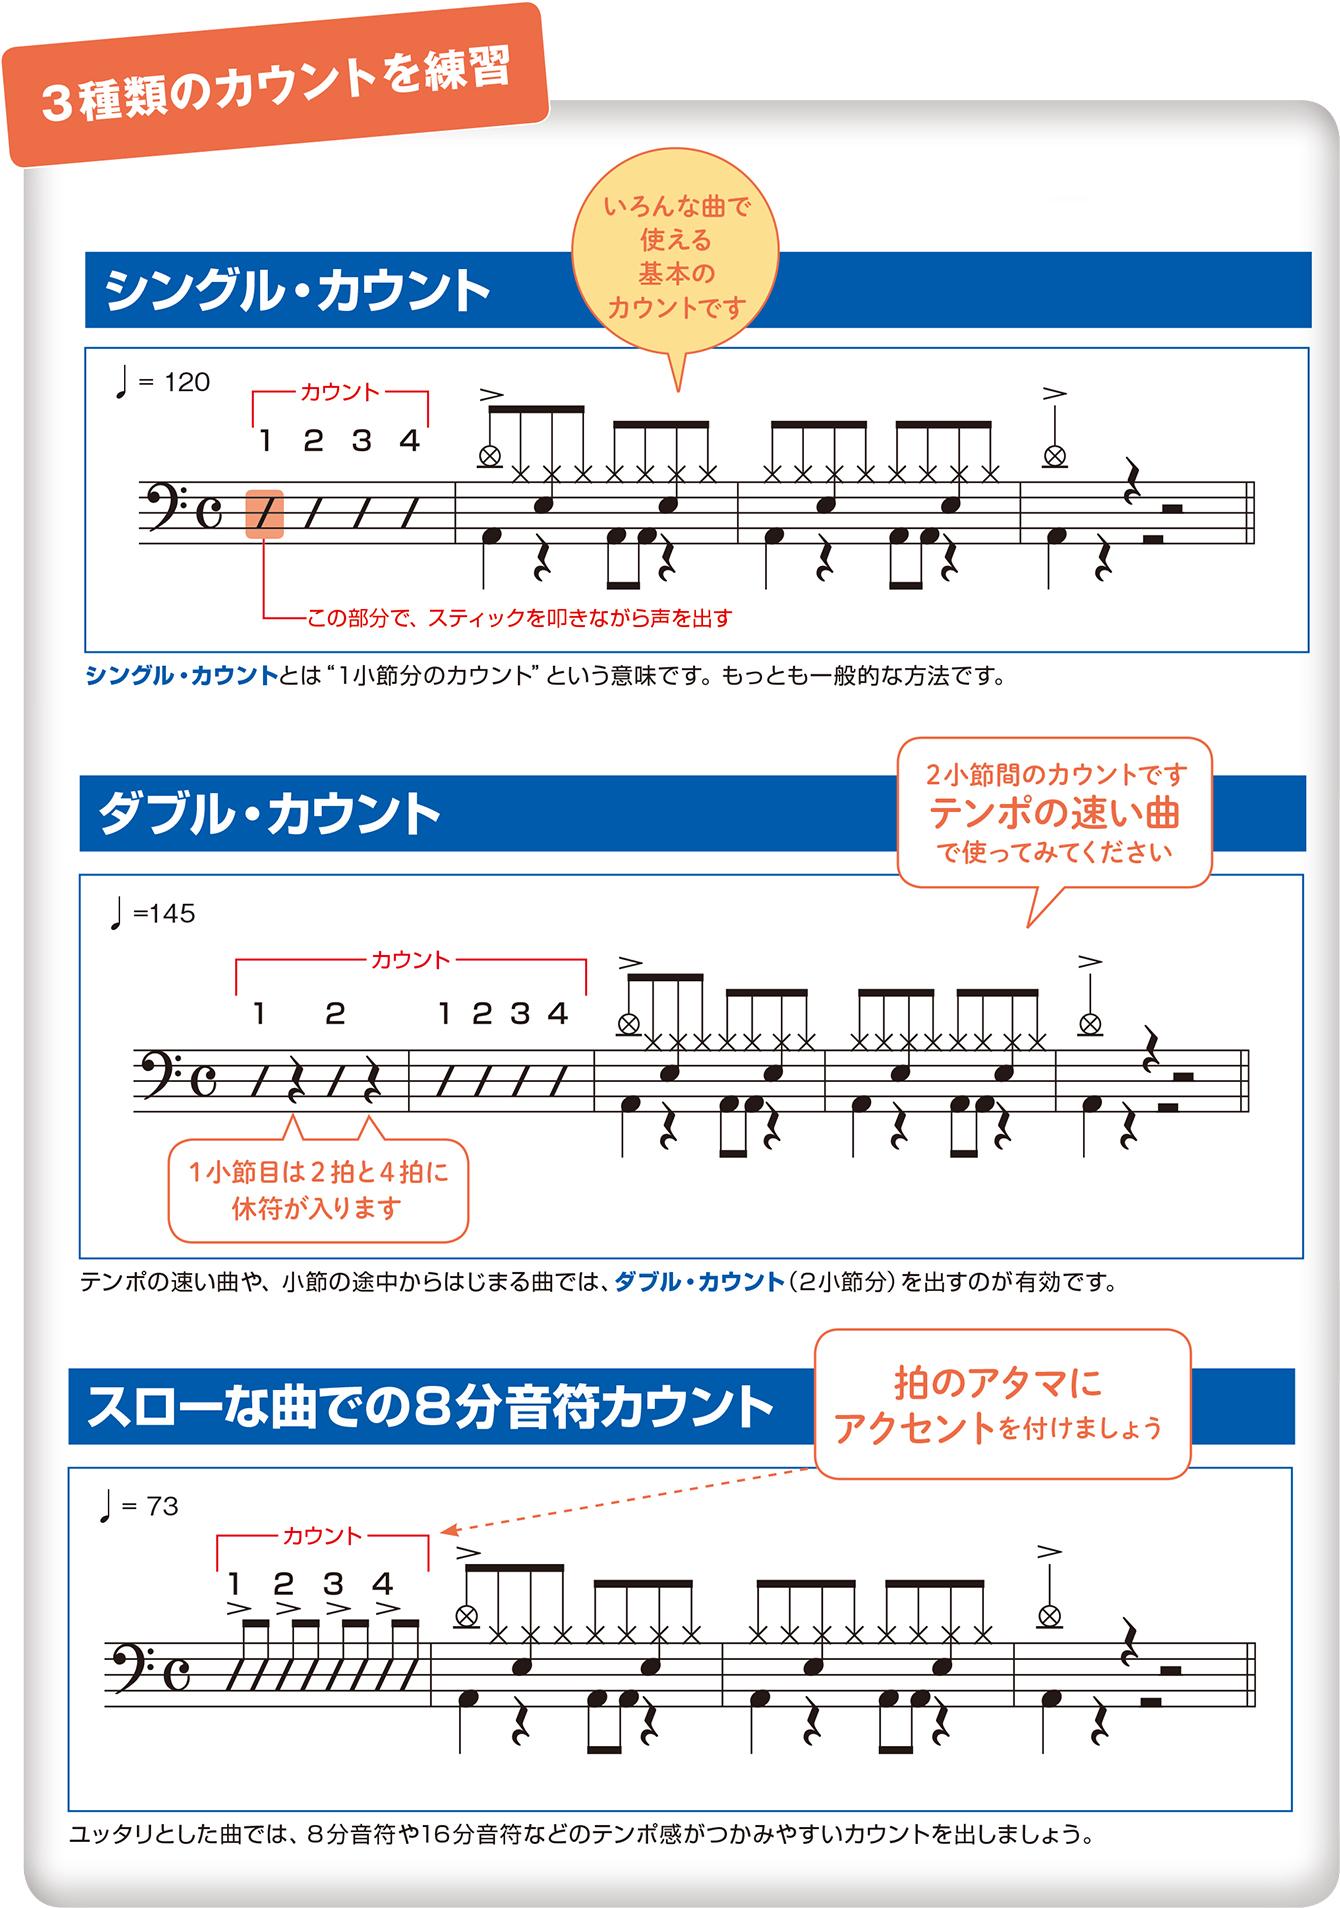 http://musicschool-navi.jp/columns/columns/assets_c/2017/keion03/keion_v3_drum_02.jpg